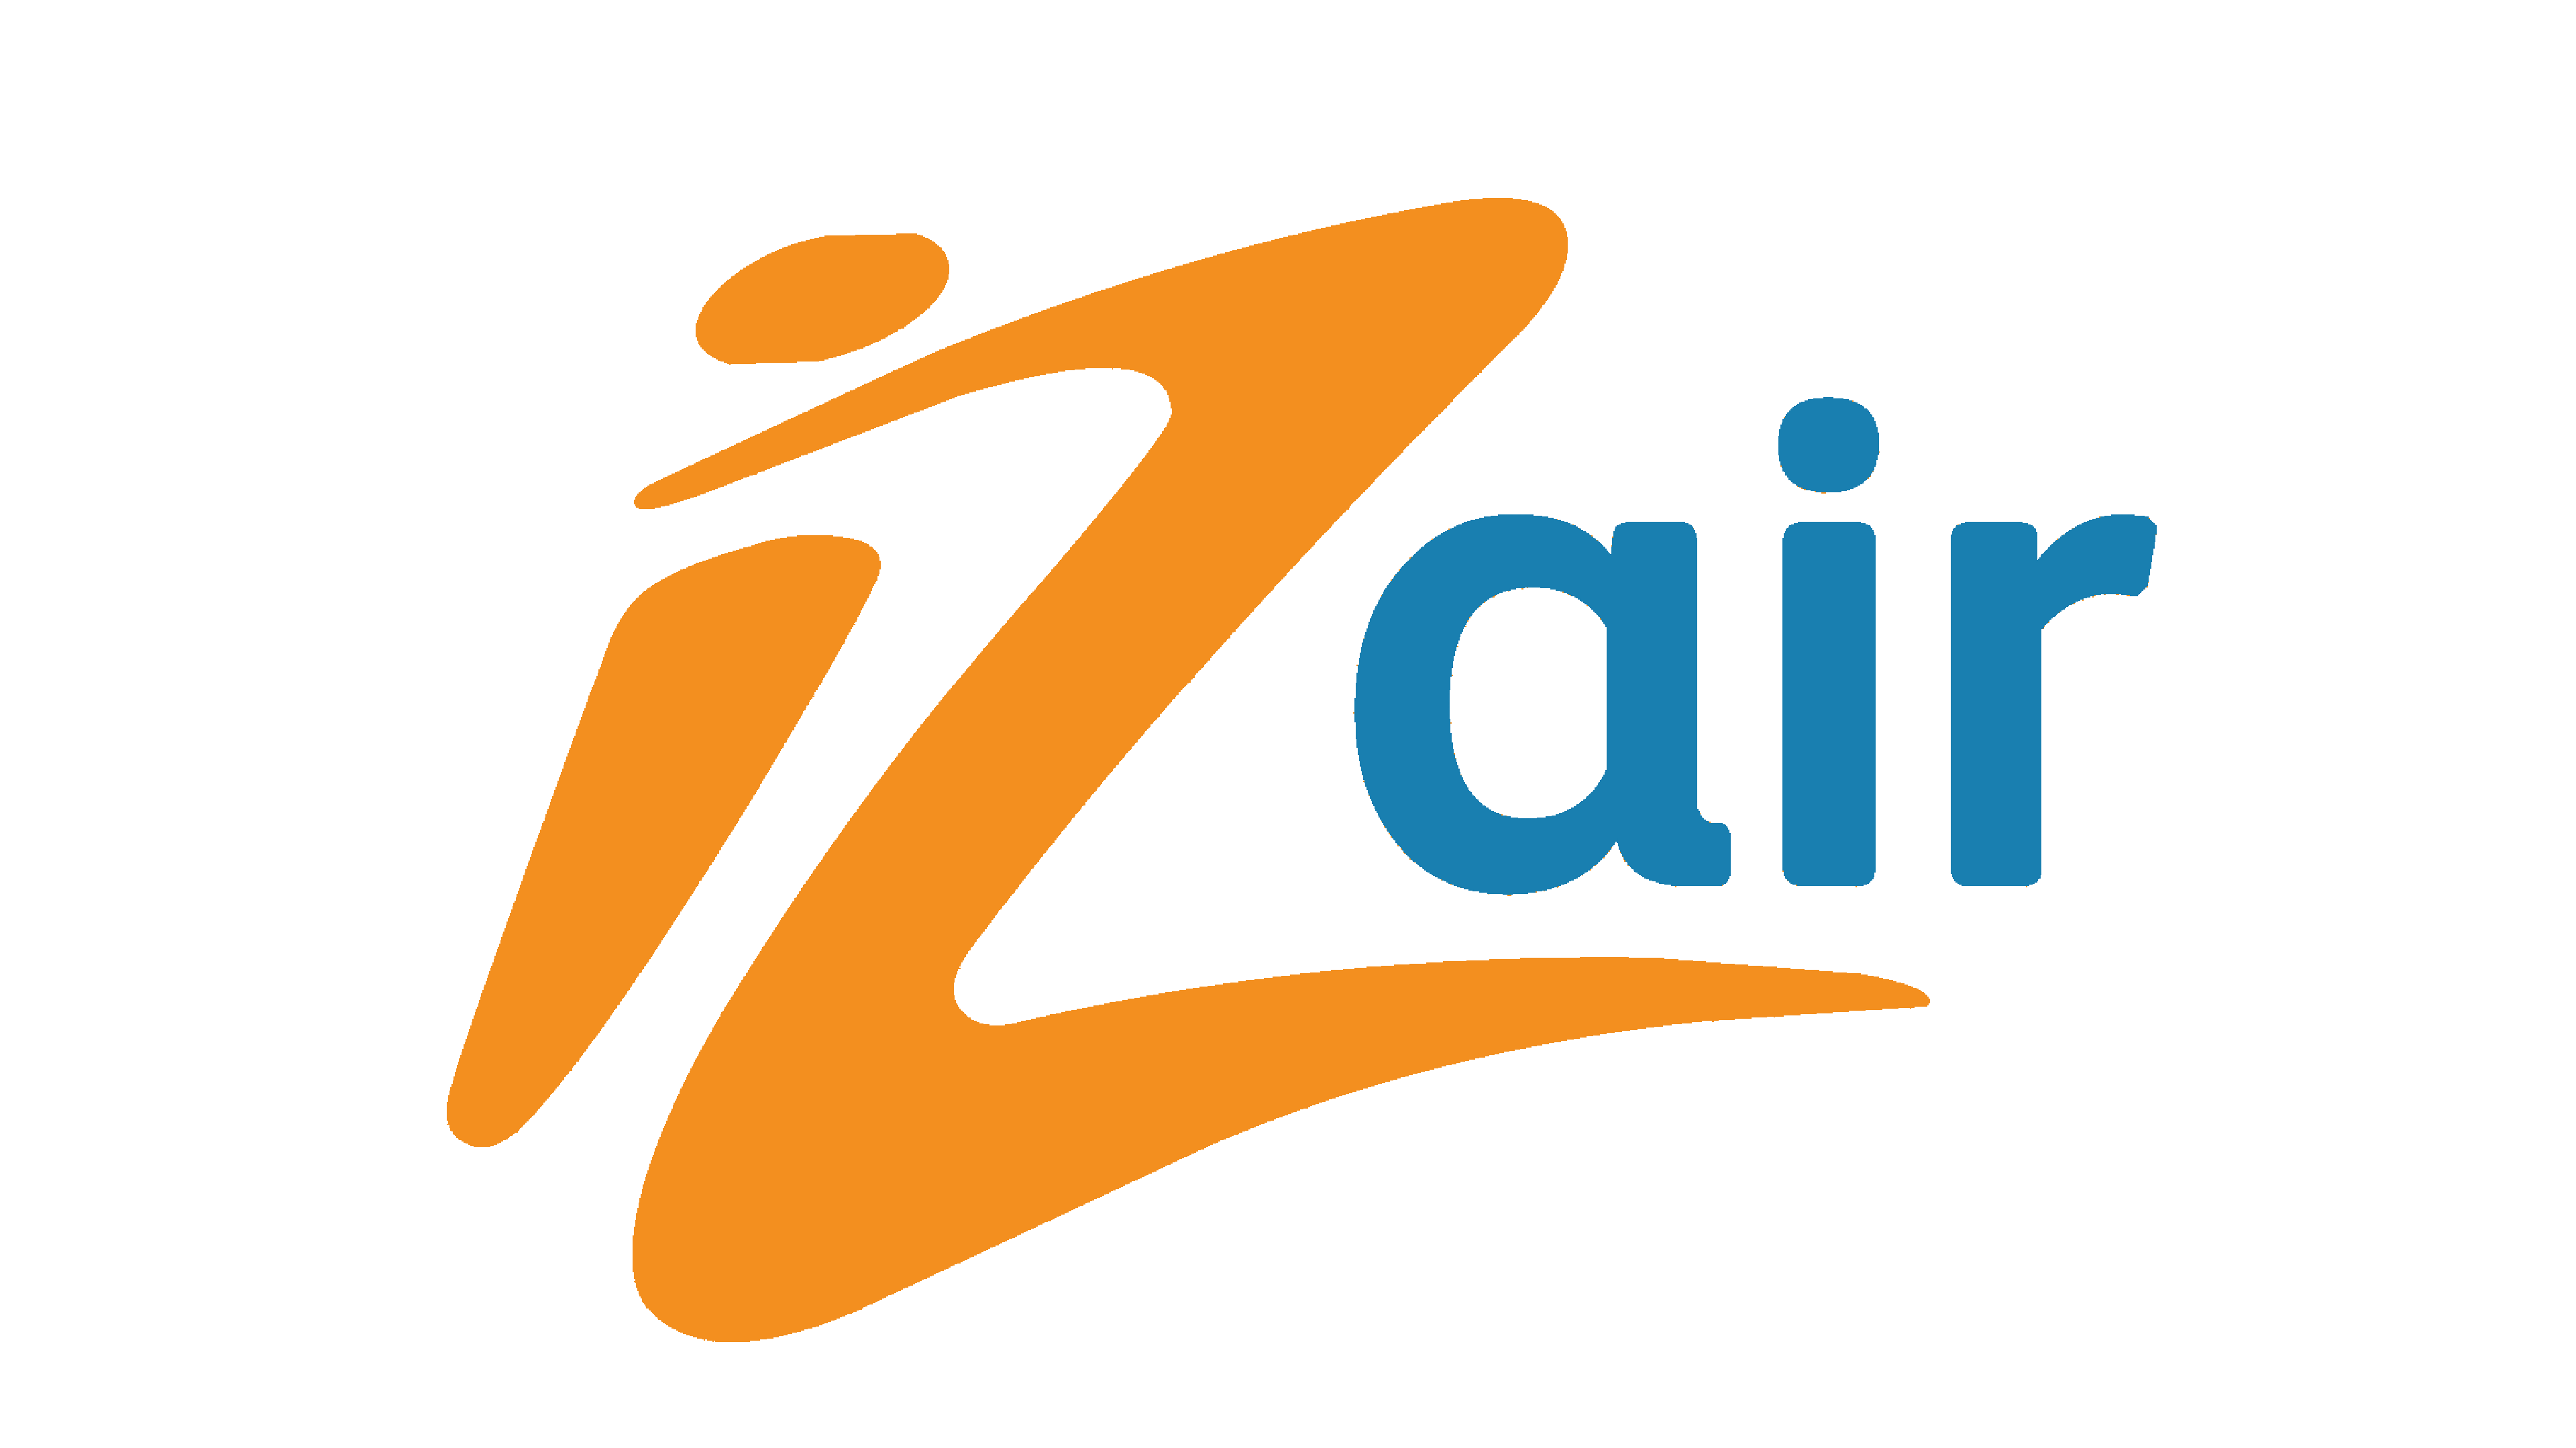 IZair Logo Logo